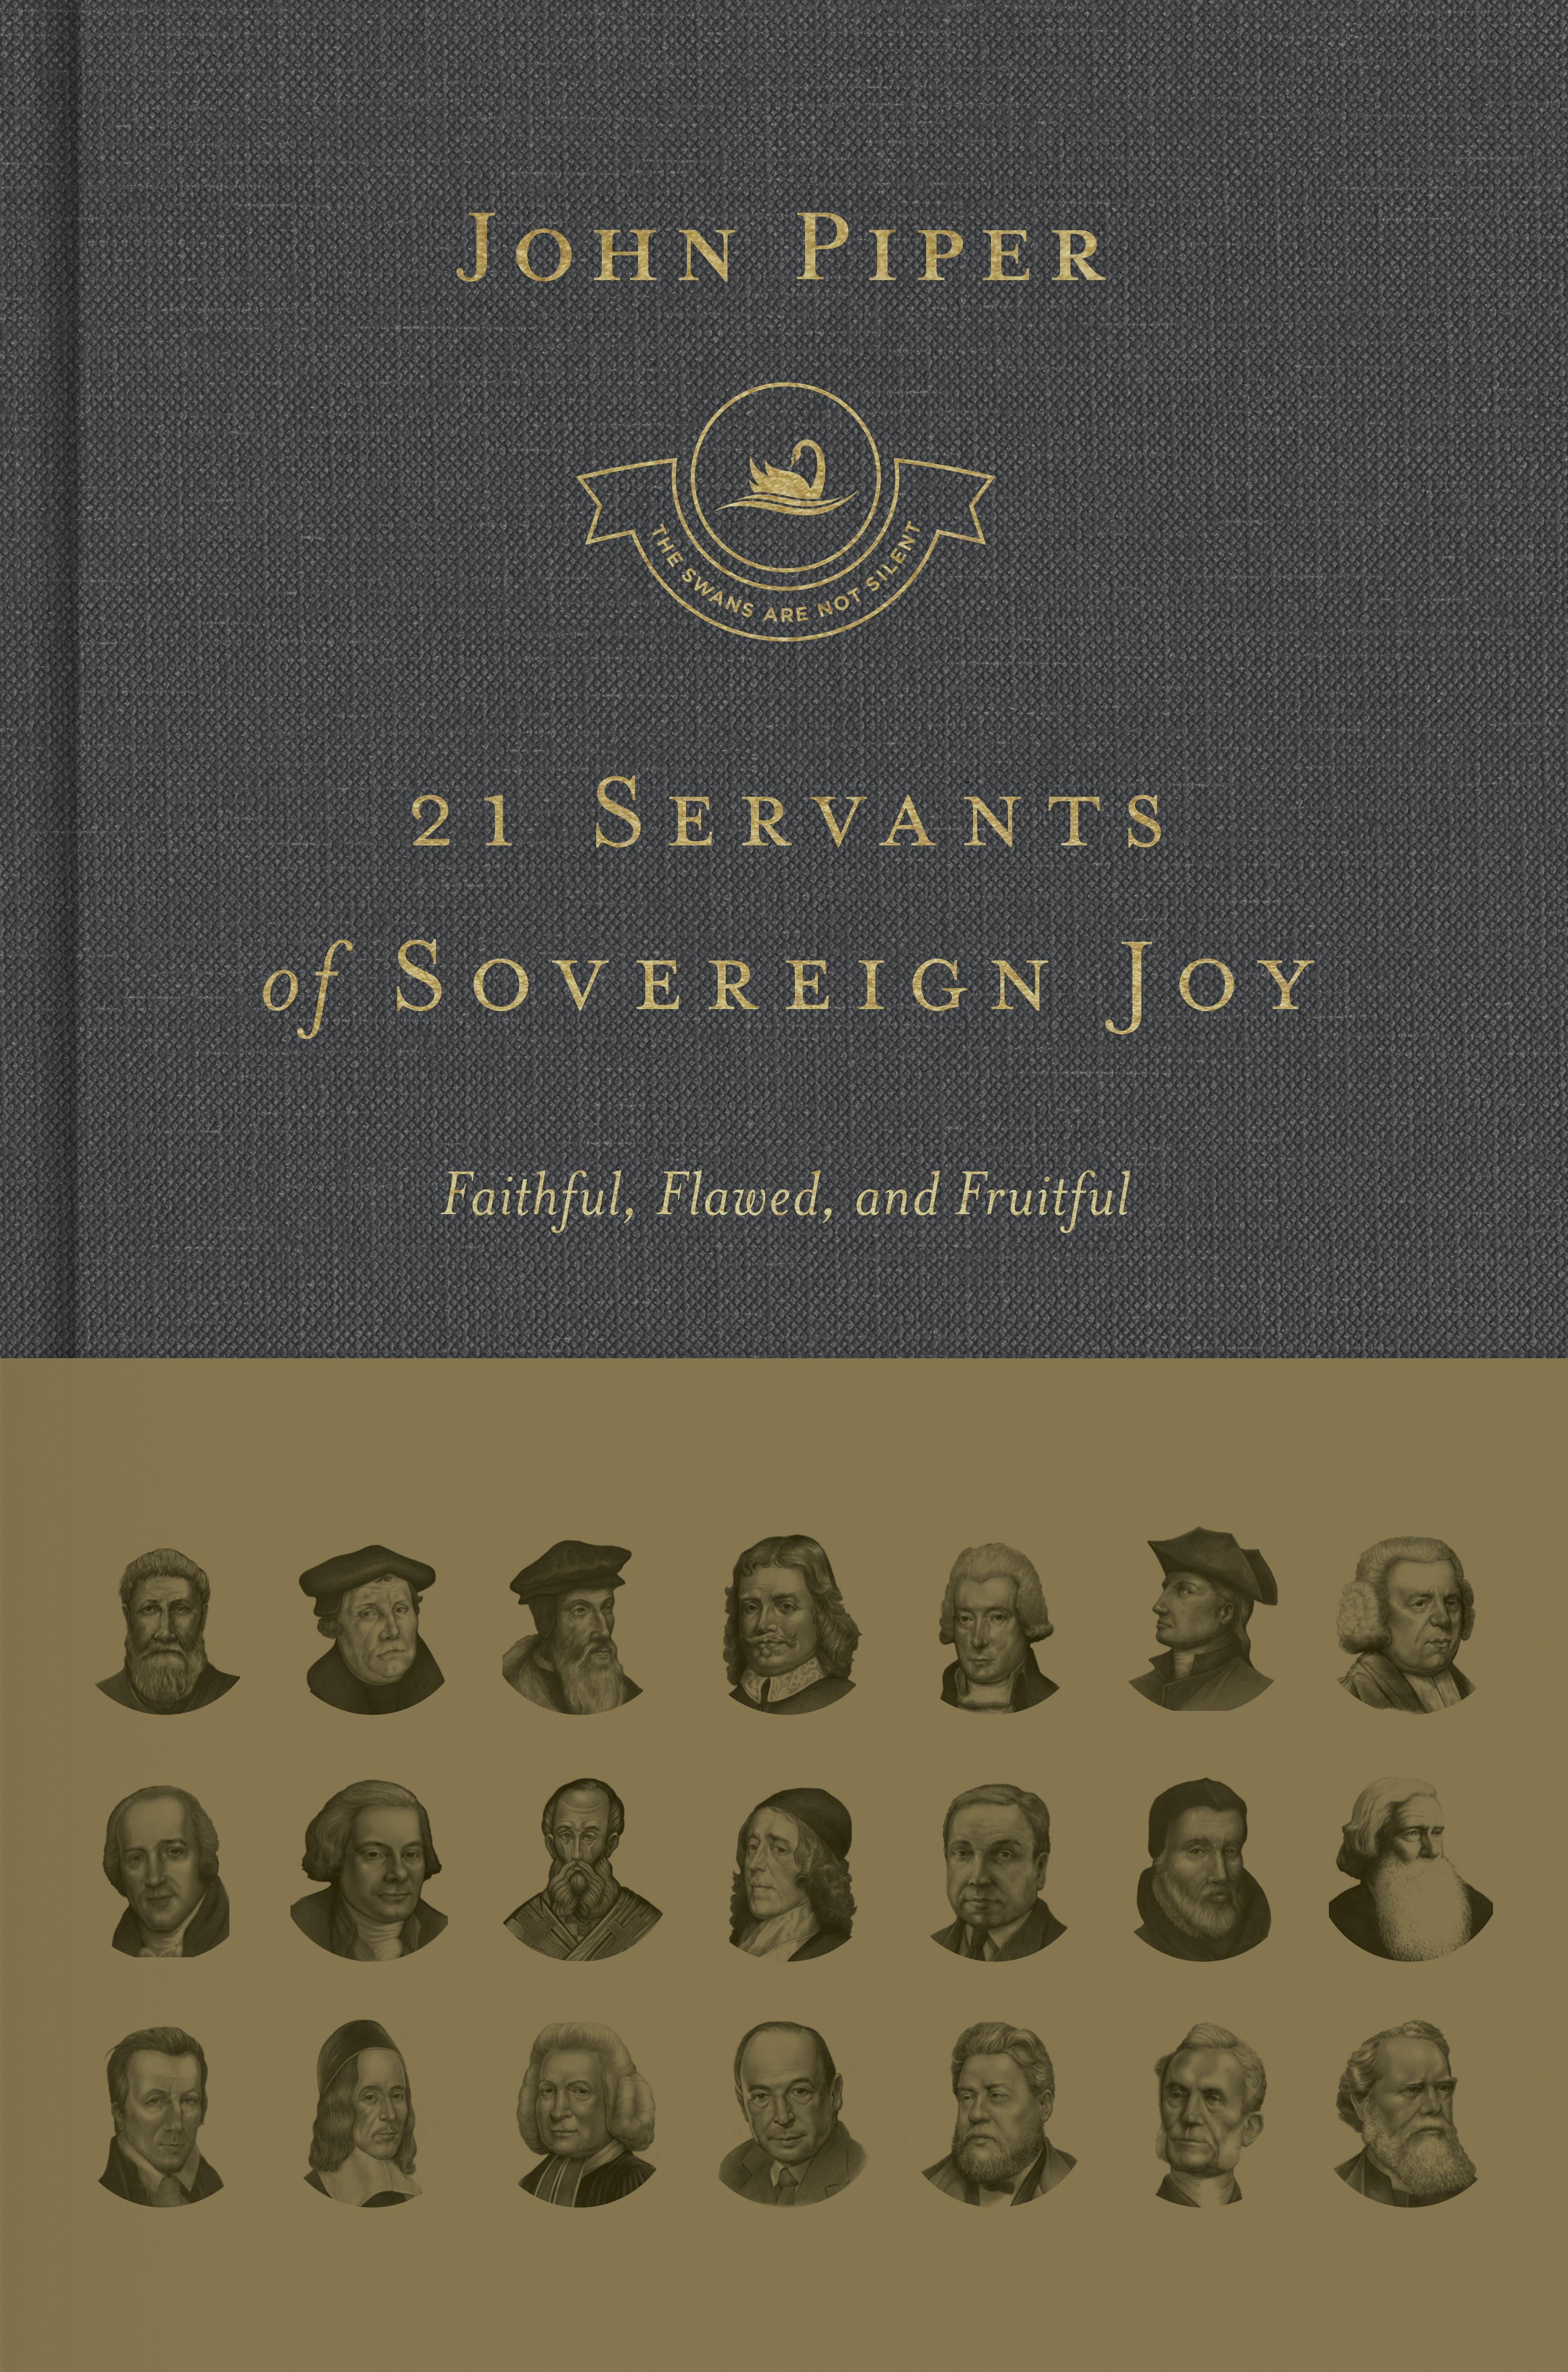 21 Servants of Sovereign Joy: Faithful, Flawed, and Fruitful